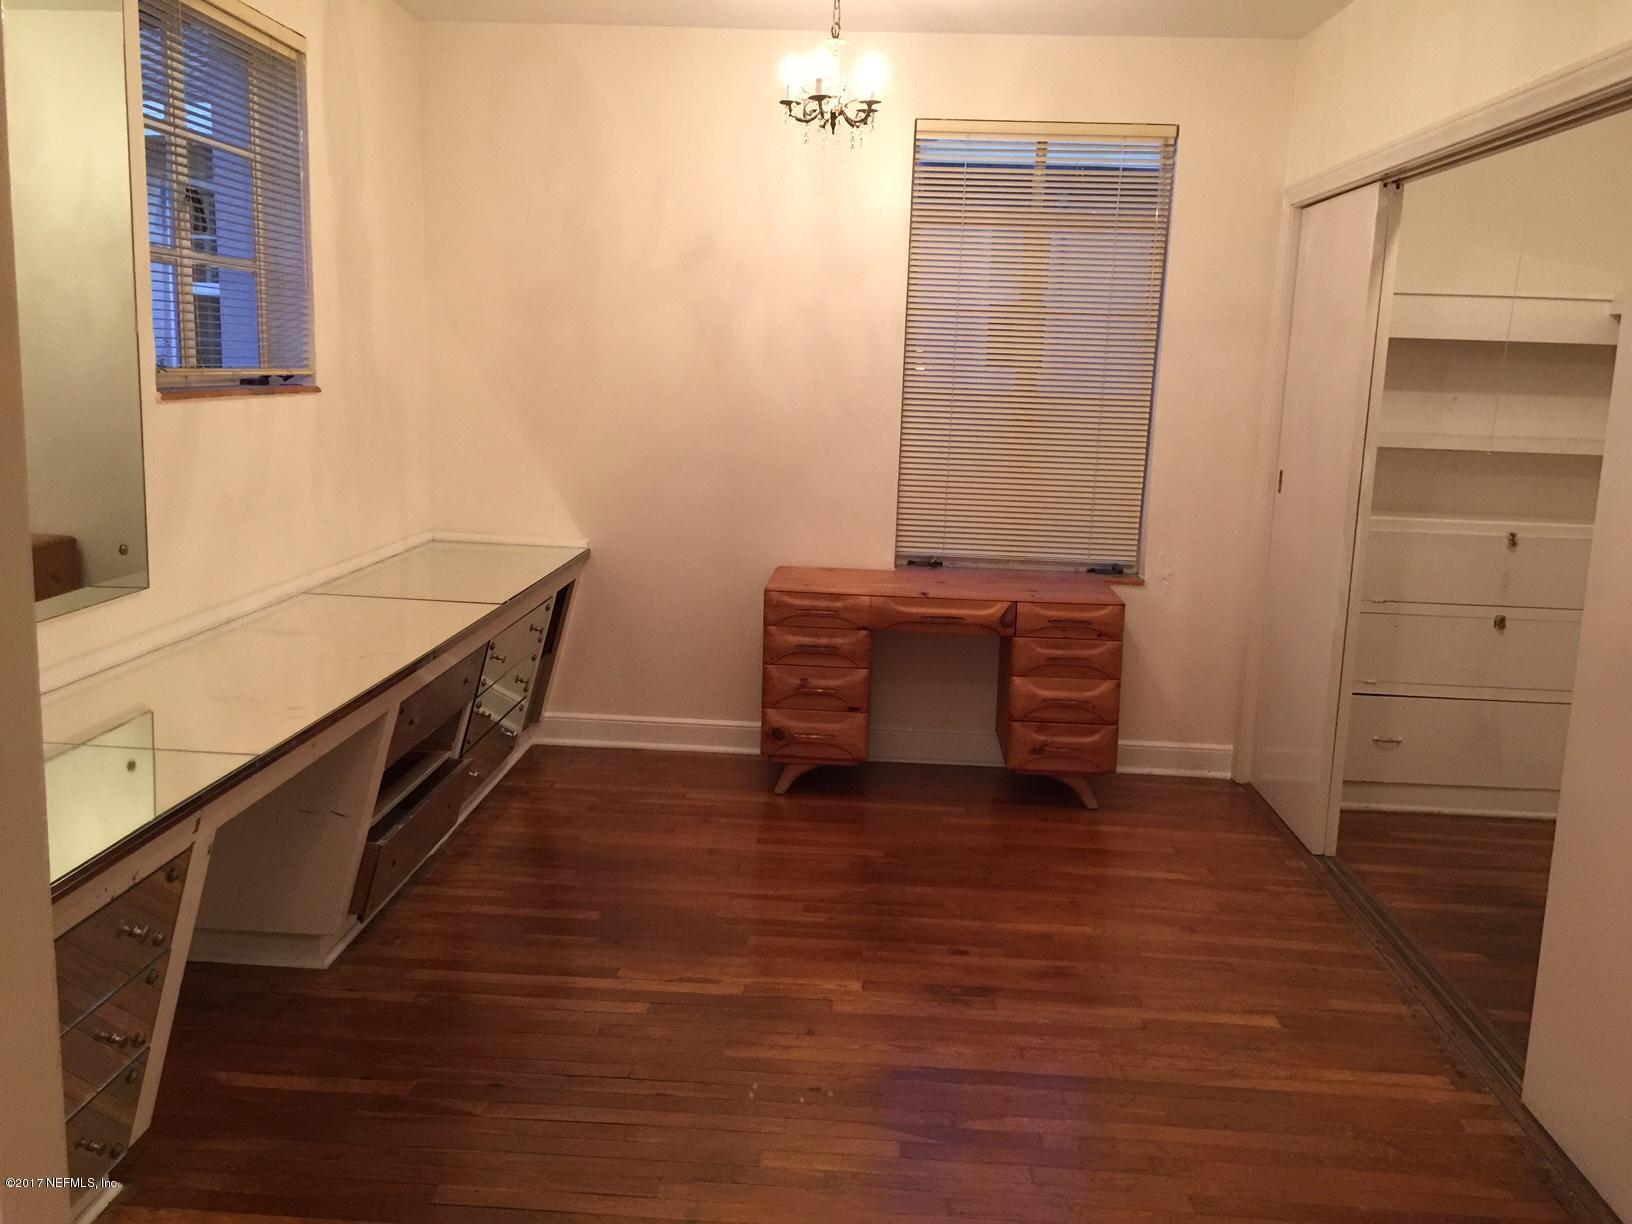 1815 LARGO, JACKSONVILLE, FLORIDA 32207, 8 Bedrooms Bedrooms, ,6 BathroomsBathrooms,Residential,For sale,LARGO,1056132